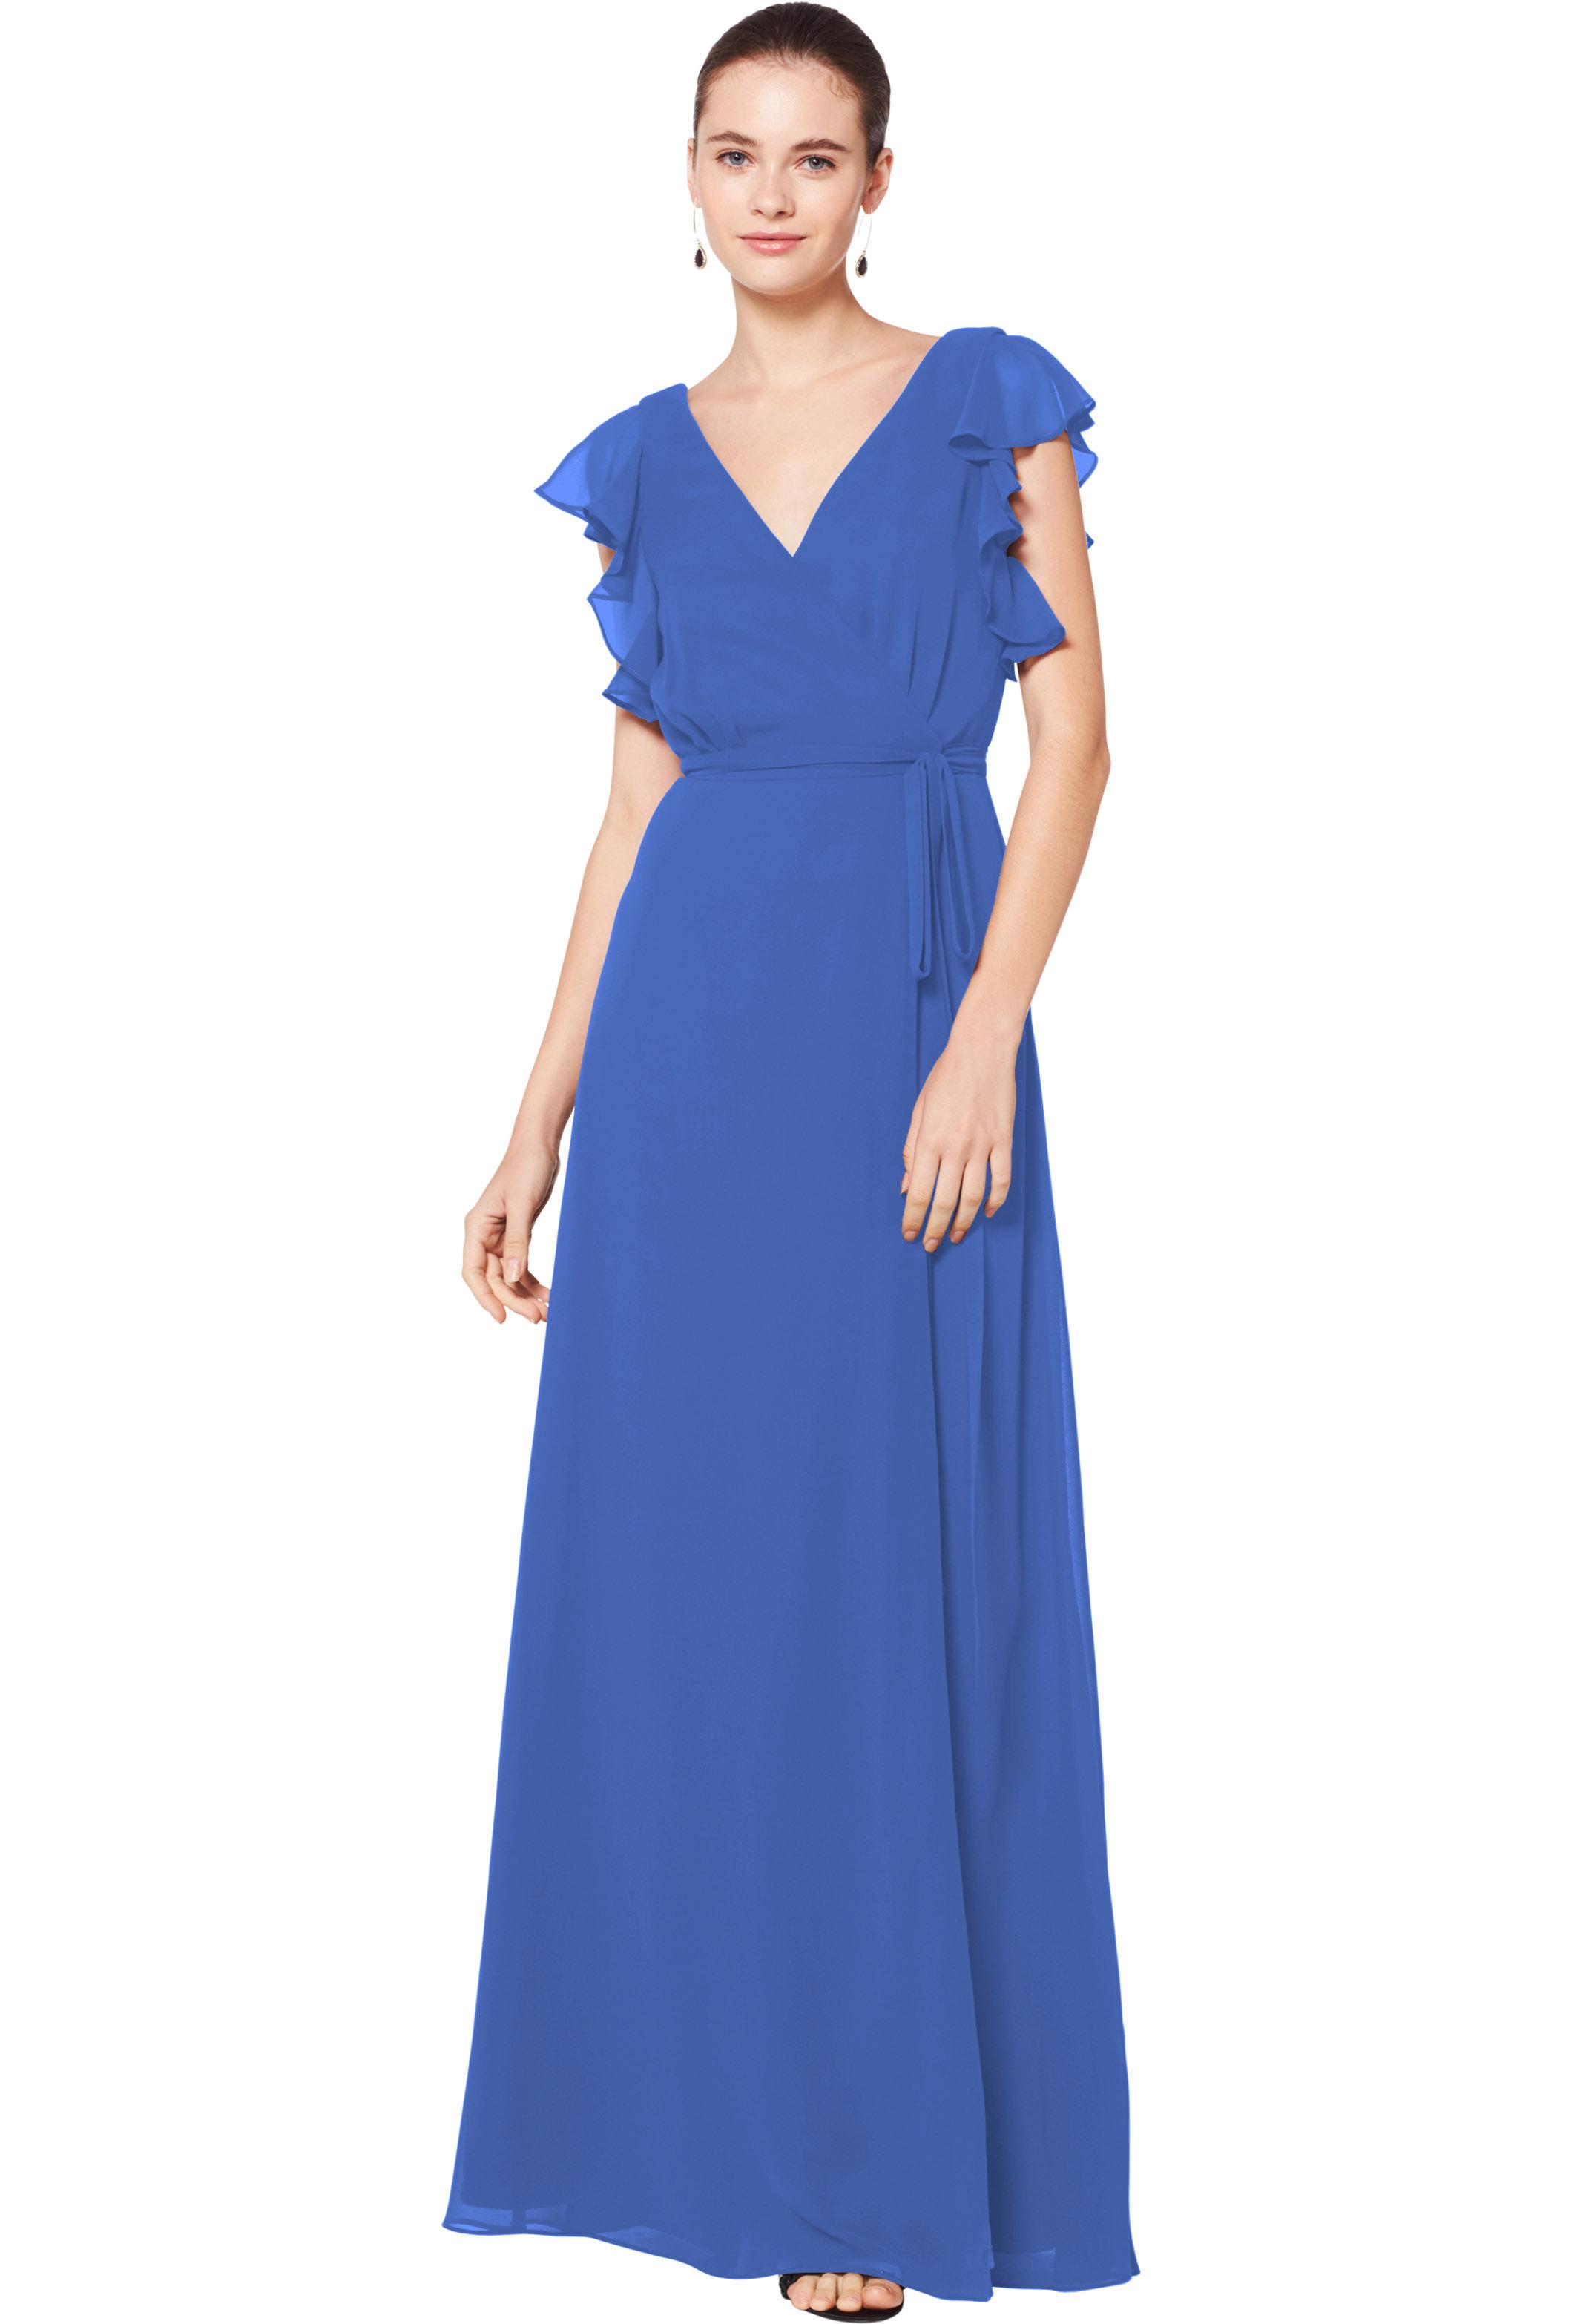 Bill Levkoff HORIZON Chiffon Sleeveless A-line gown, $180.00 Front